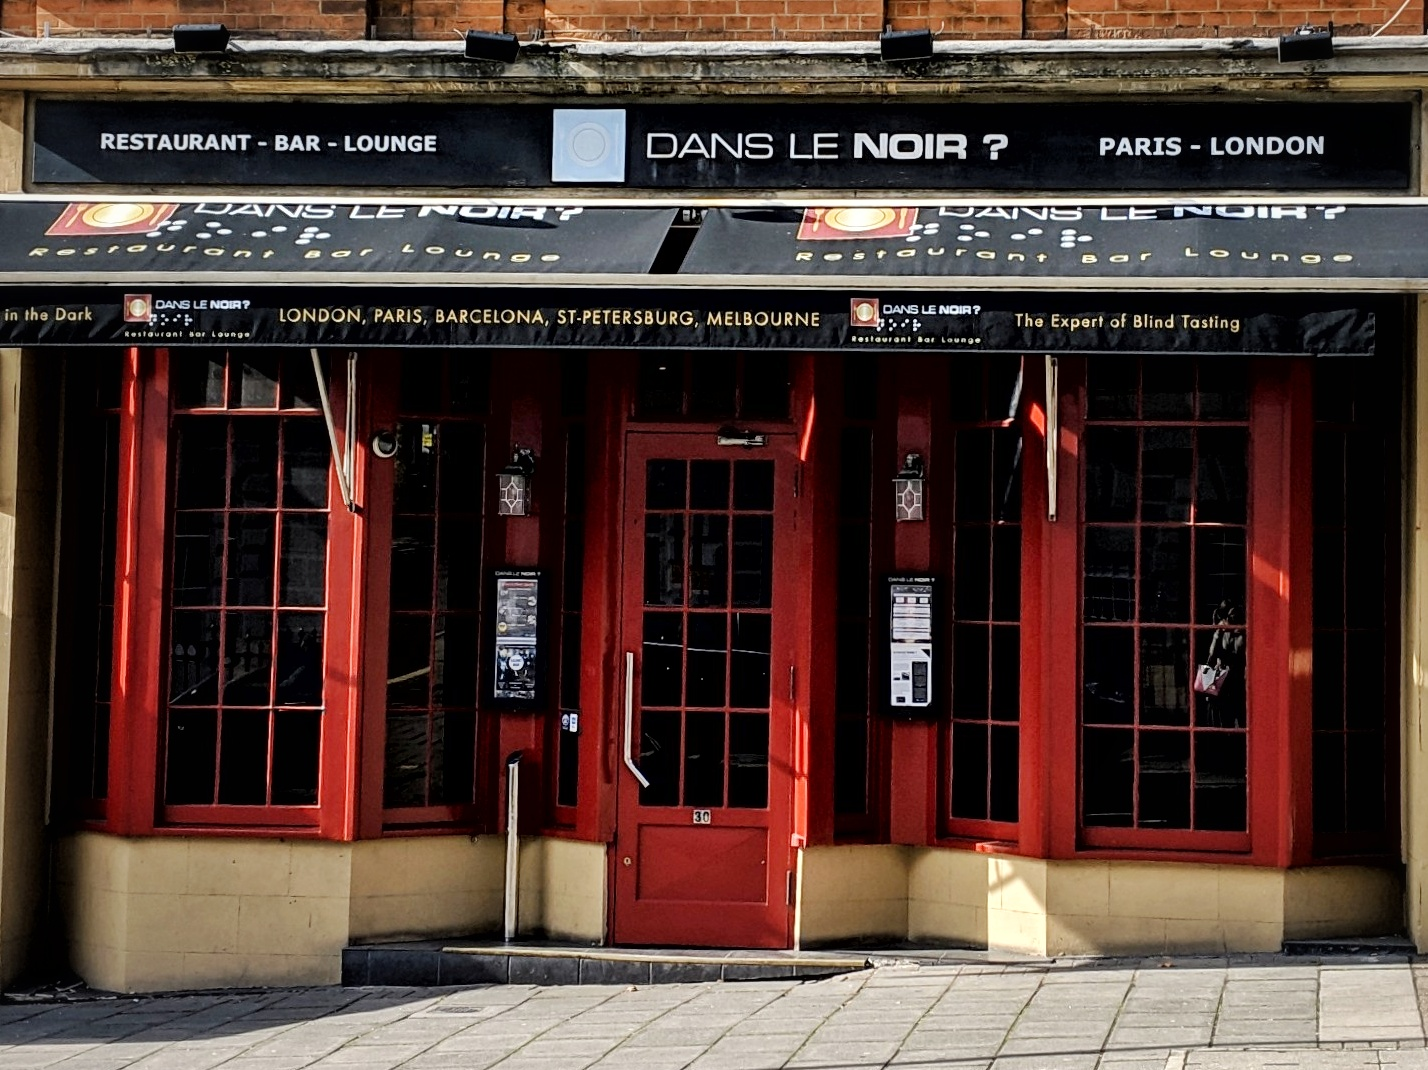 Dans Le Noir? Restaurant in Clerkenwell, London